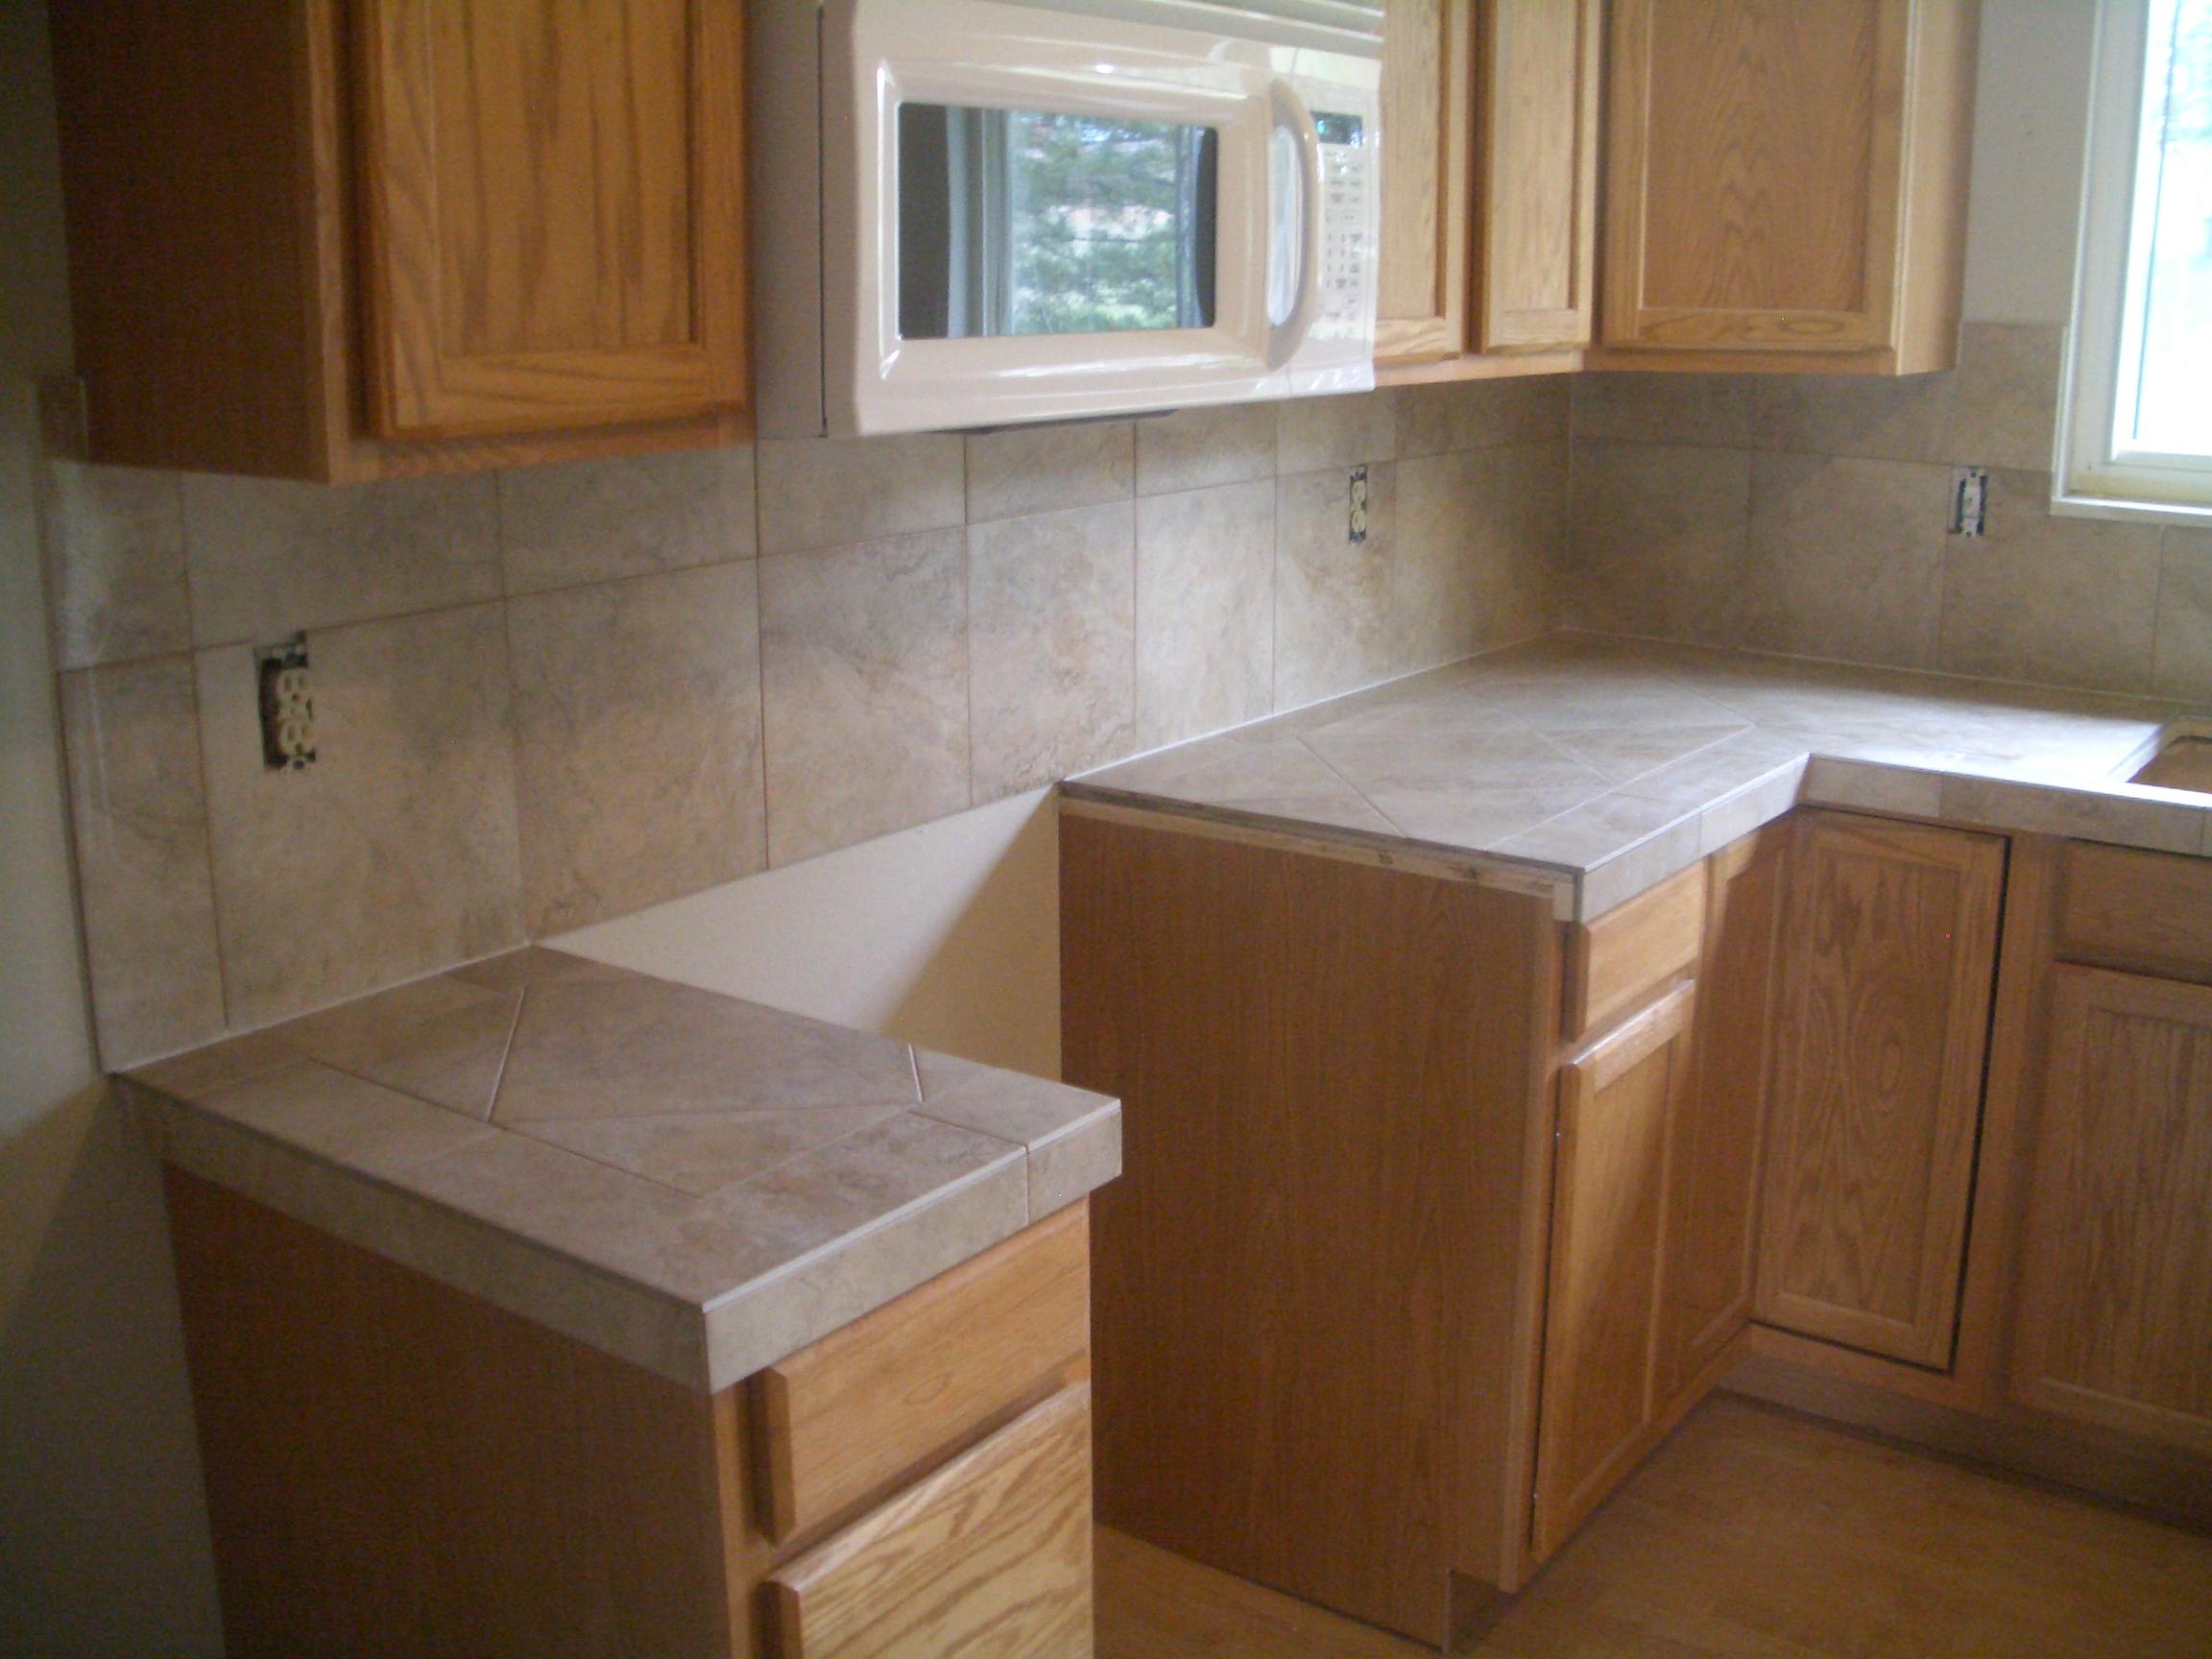 kitchen tile tile kitchen countertops Porcelain kitchen countertops and backsplash